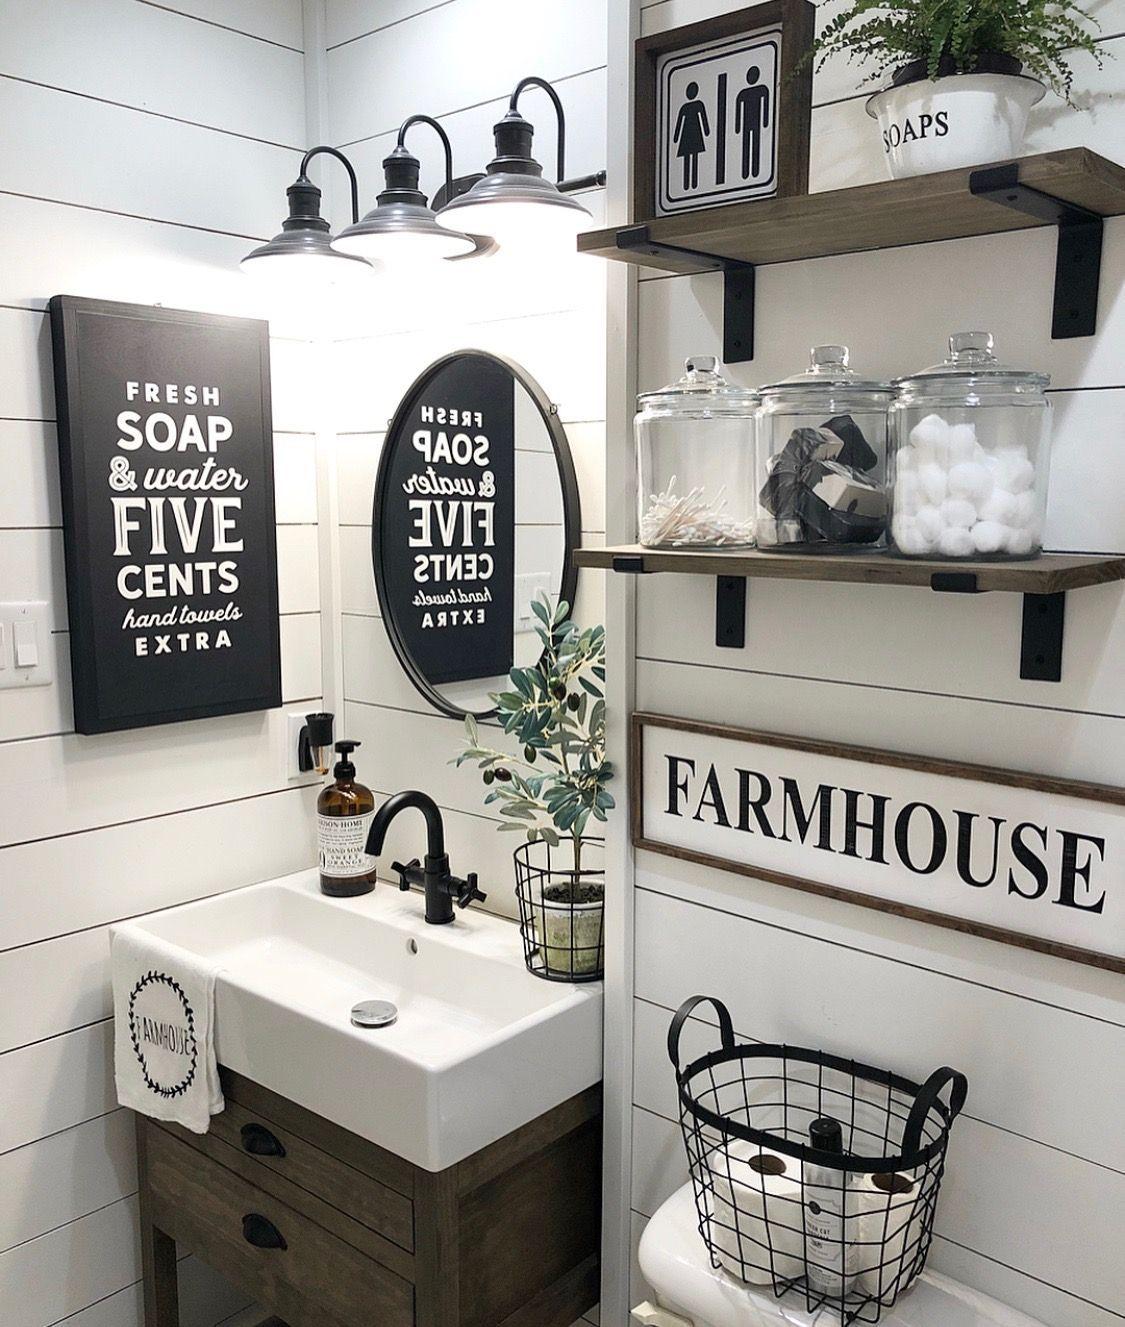 Too Much But Cute Individual Ideas 36 Beautiful Farmhouse Bathroom Design And Decor Idea Bathroom Farmhouse Style Small Bathroom Decor Farmhouse Bathroom Decor